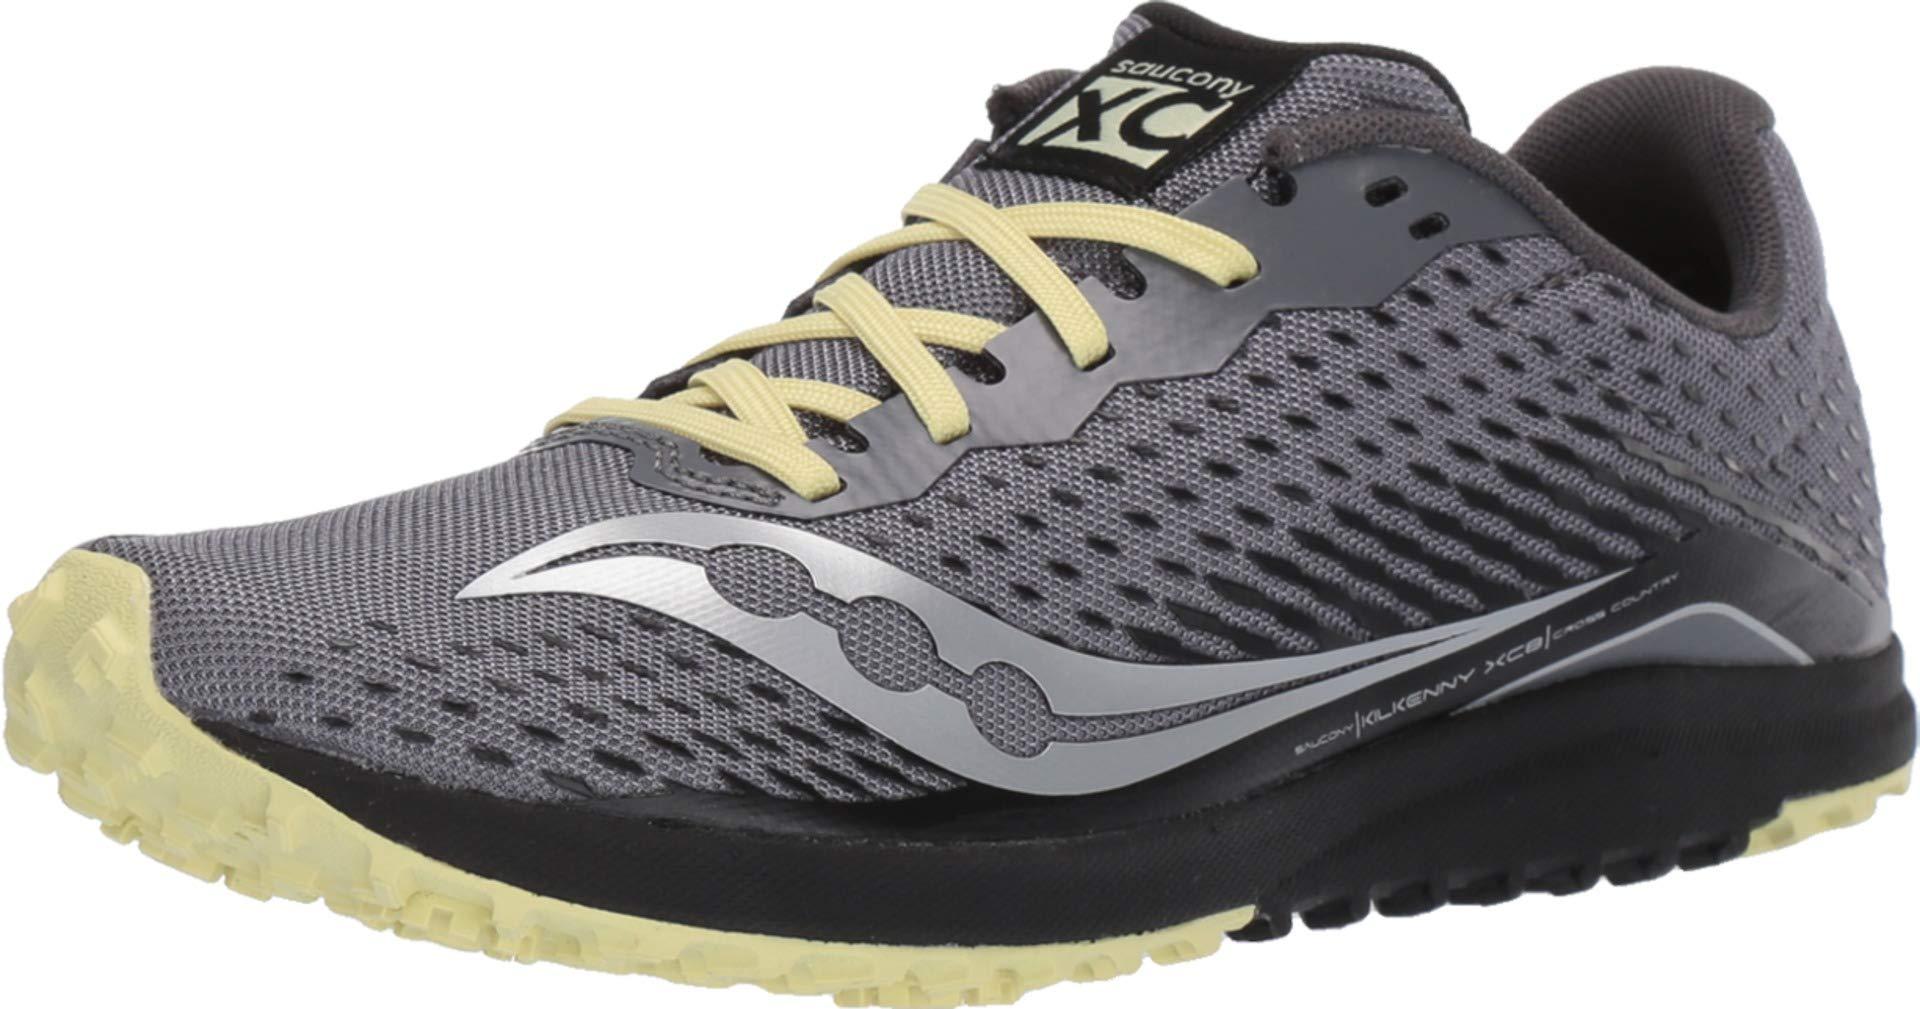 Saucony Women's Kilkenny XC8 Flat Track Shoe, Black/Yellow, 5 Medium US